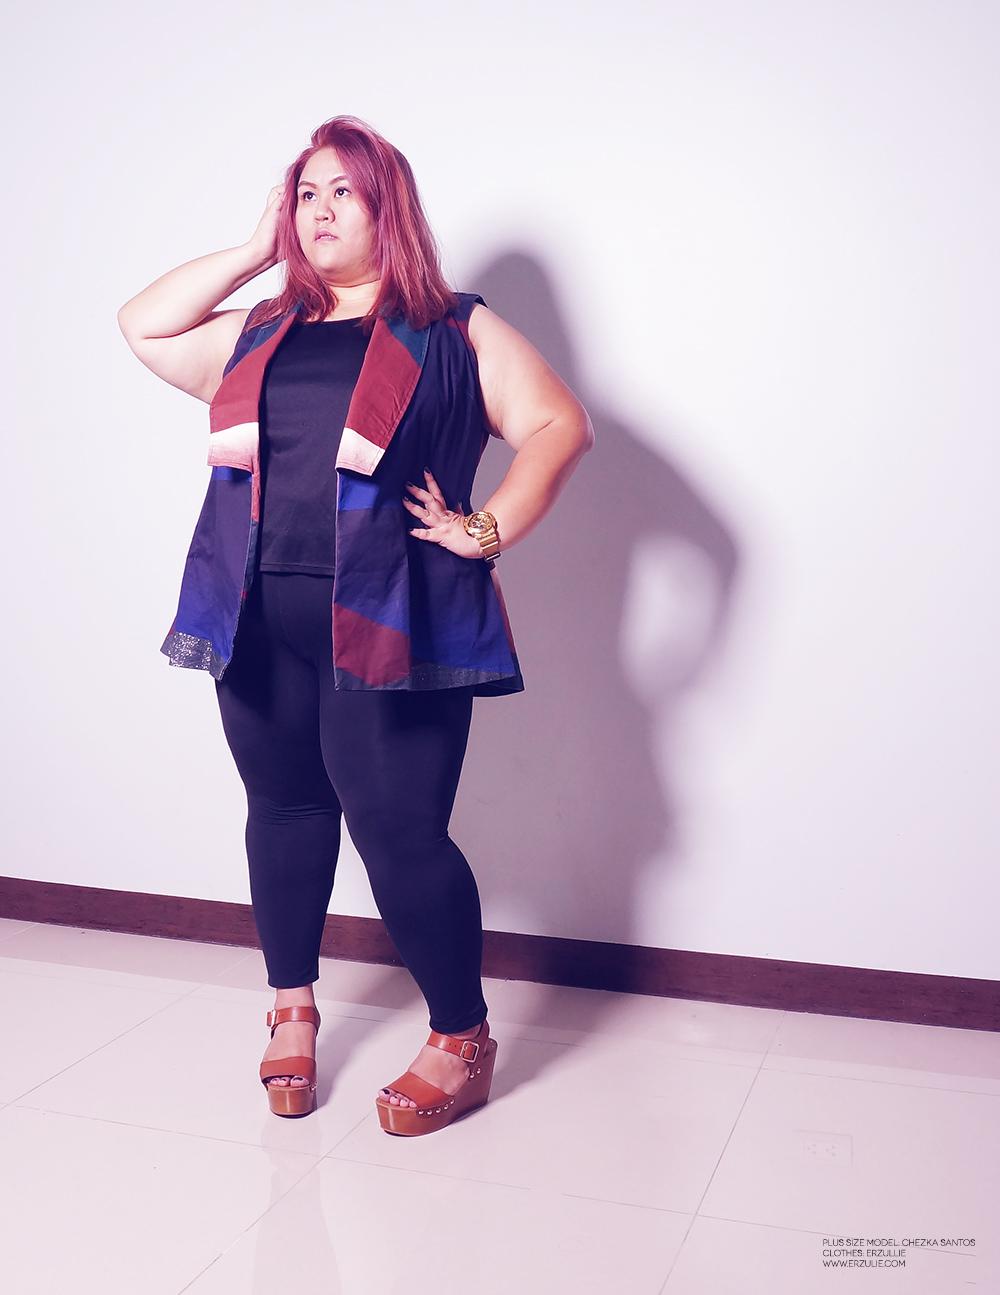 Erzullie Fierce Plus Size Fashion Philippines: PLUS SIZE MODEL ...